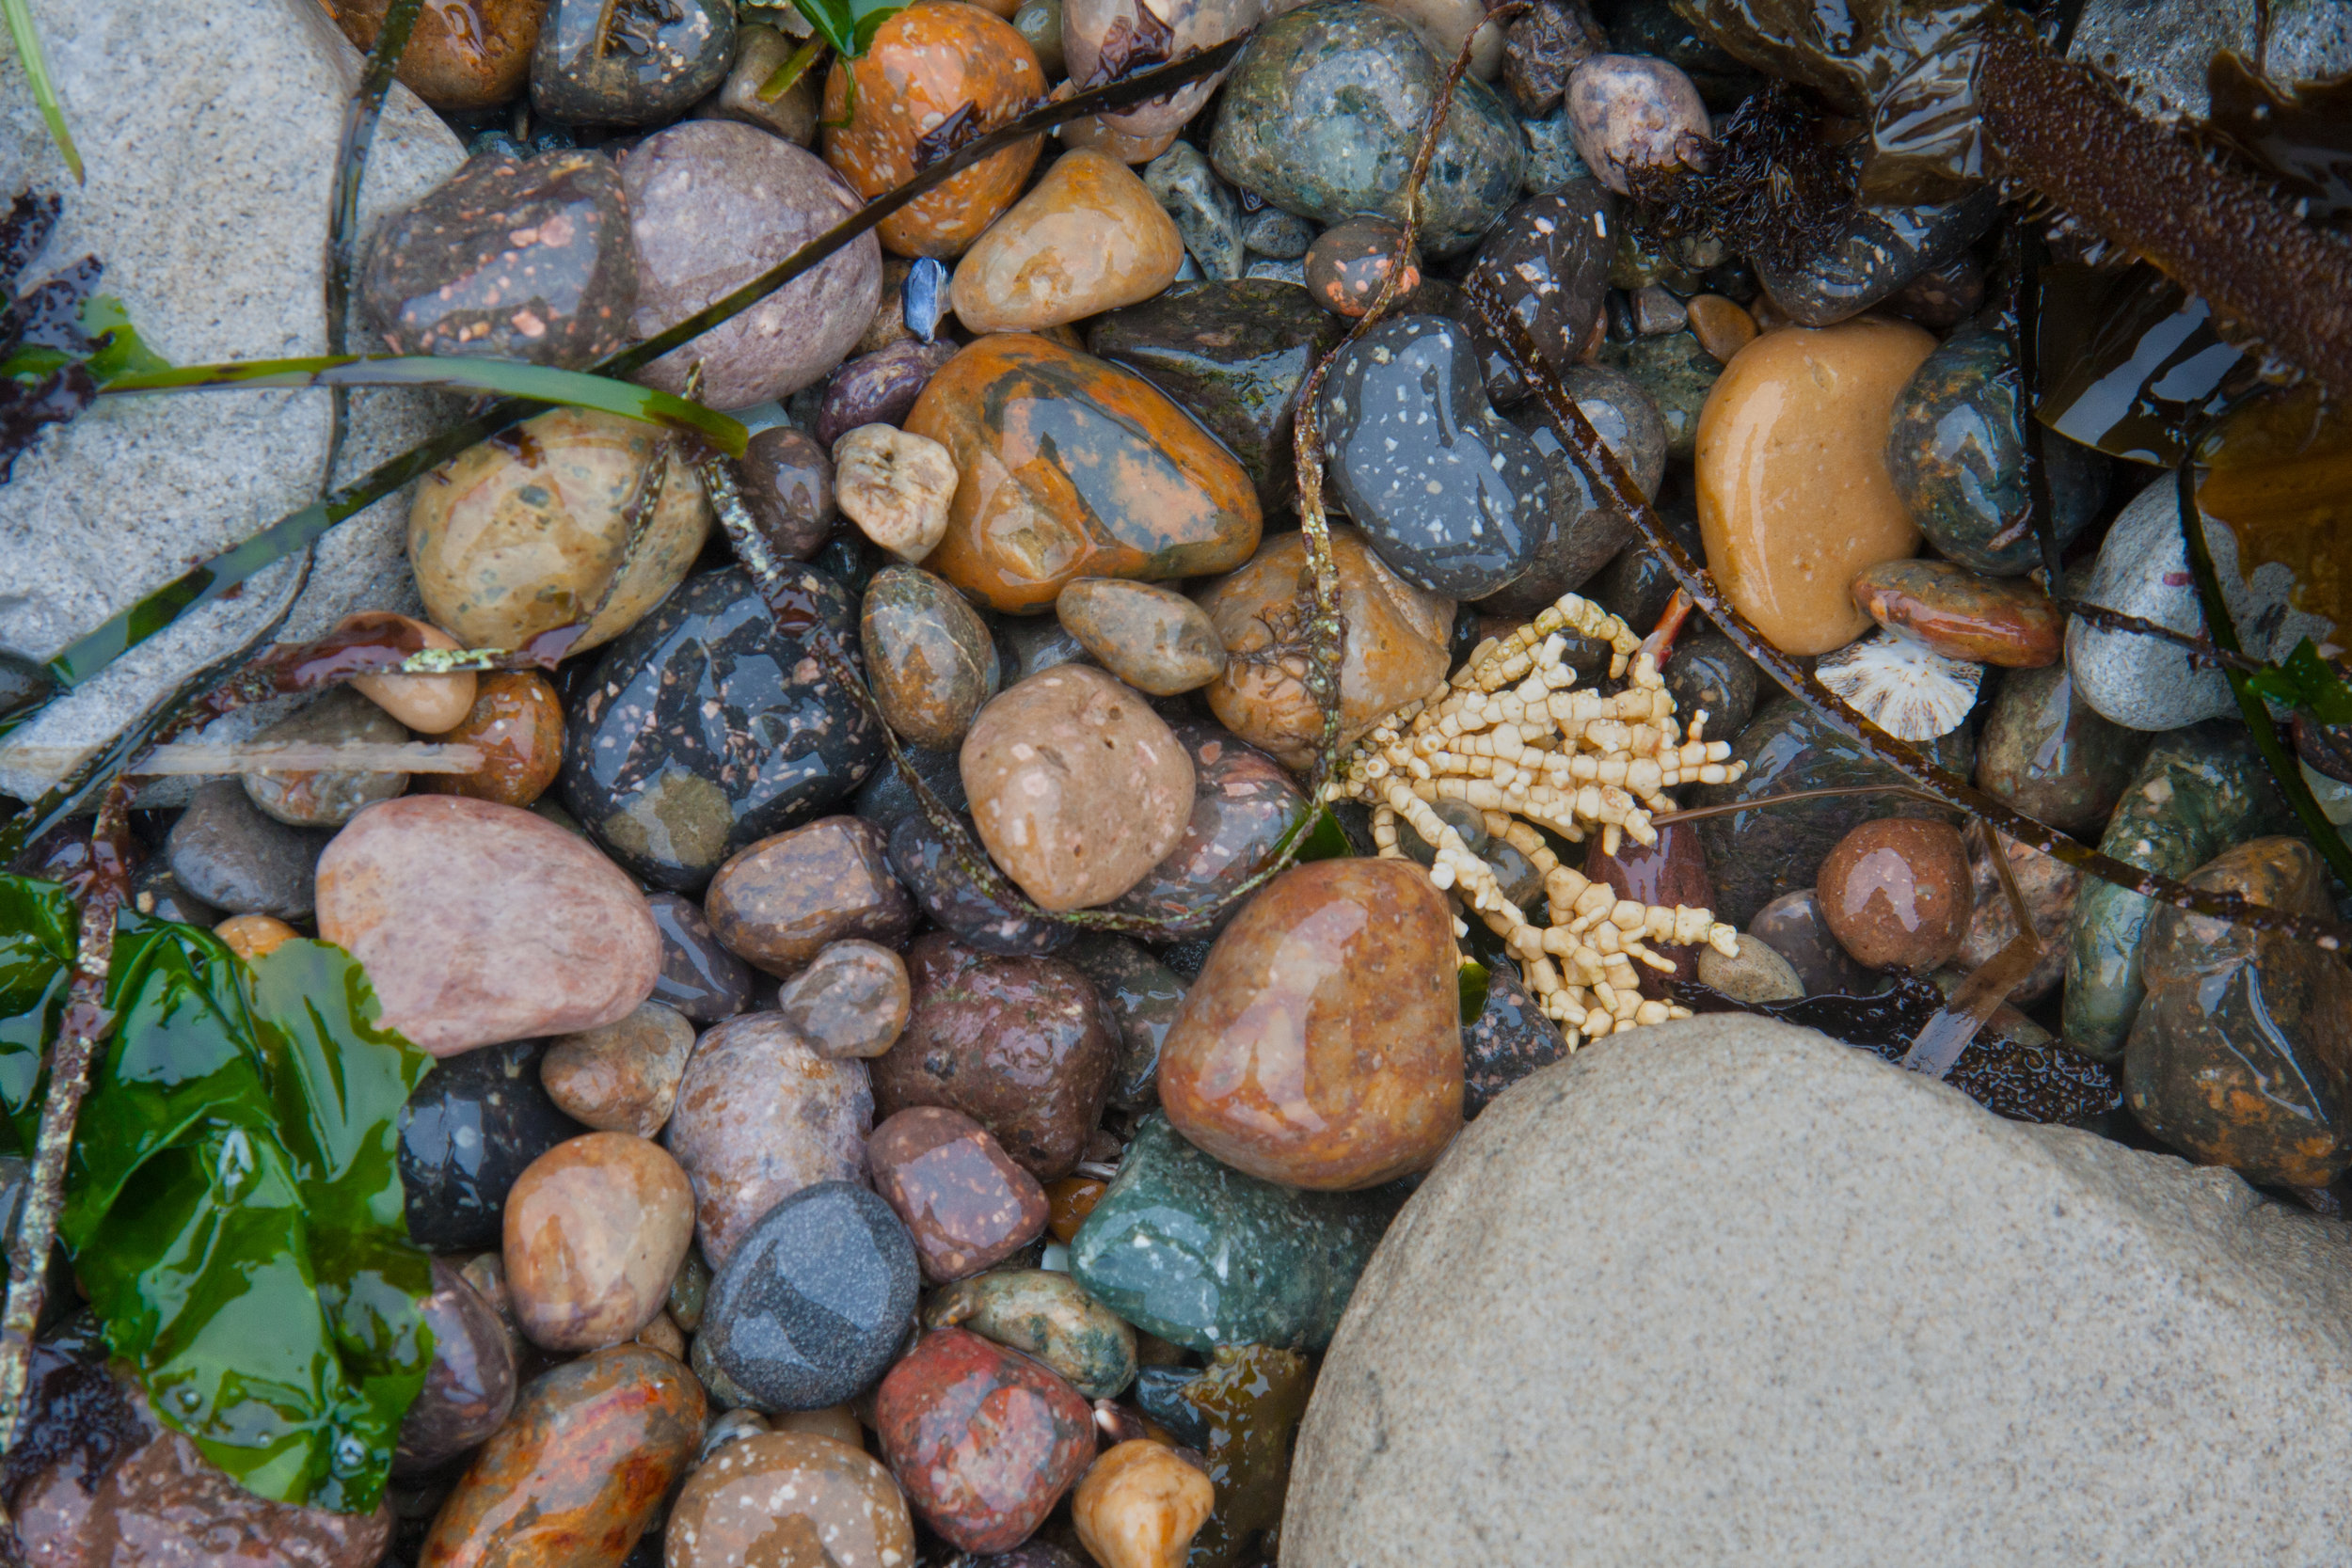 coralAndWetPebbles01.jpg